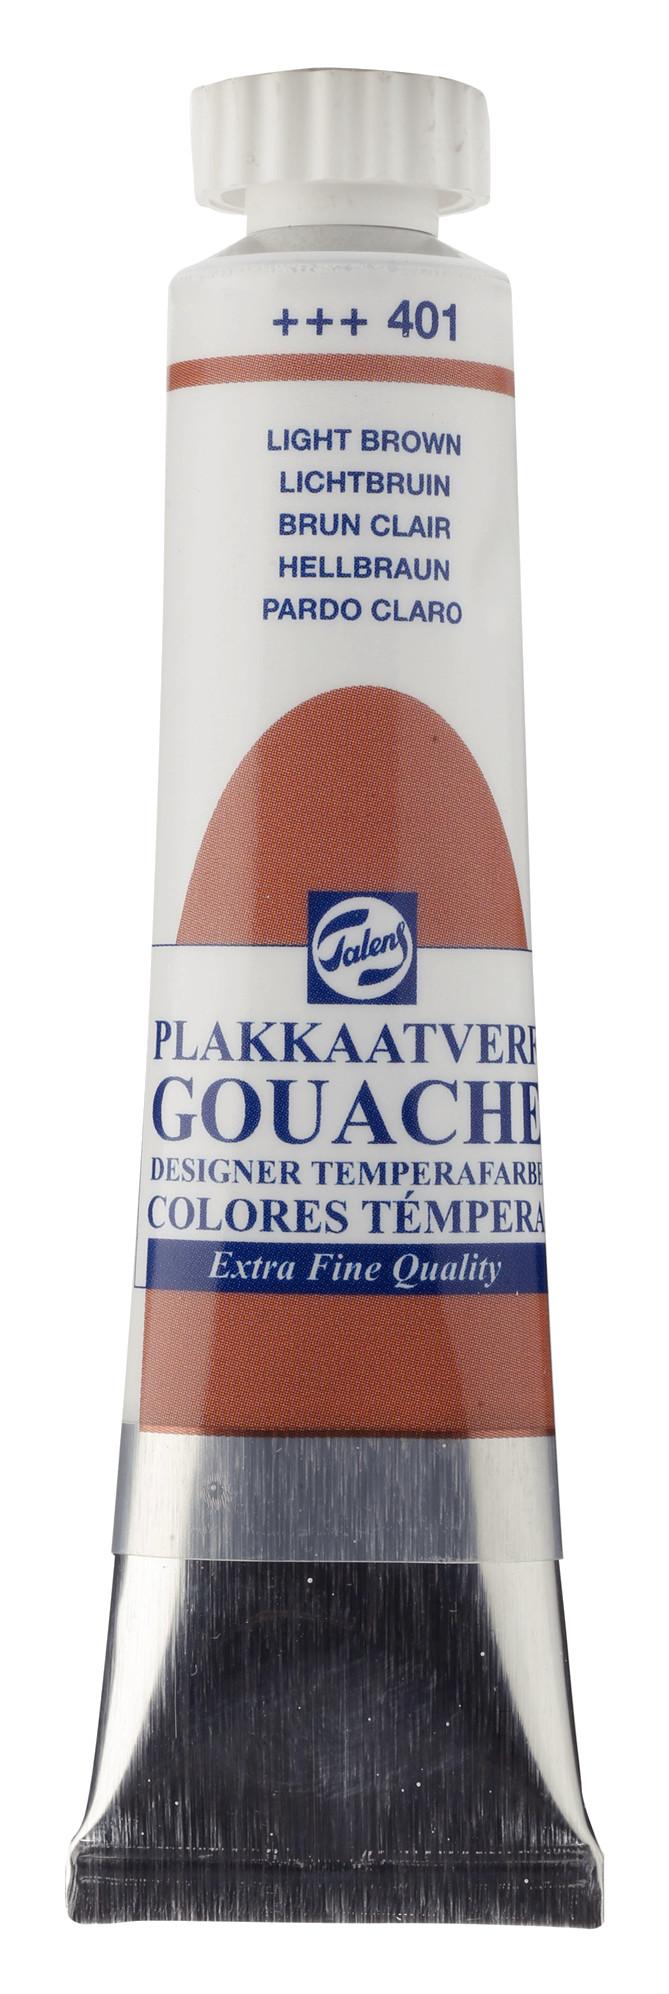 Gouache Extra Fine Quality Tube 20 ml Light Brown 401